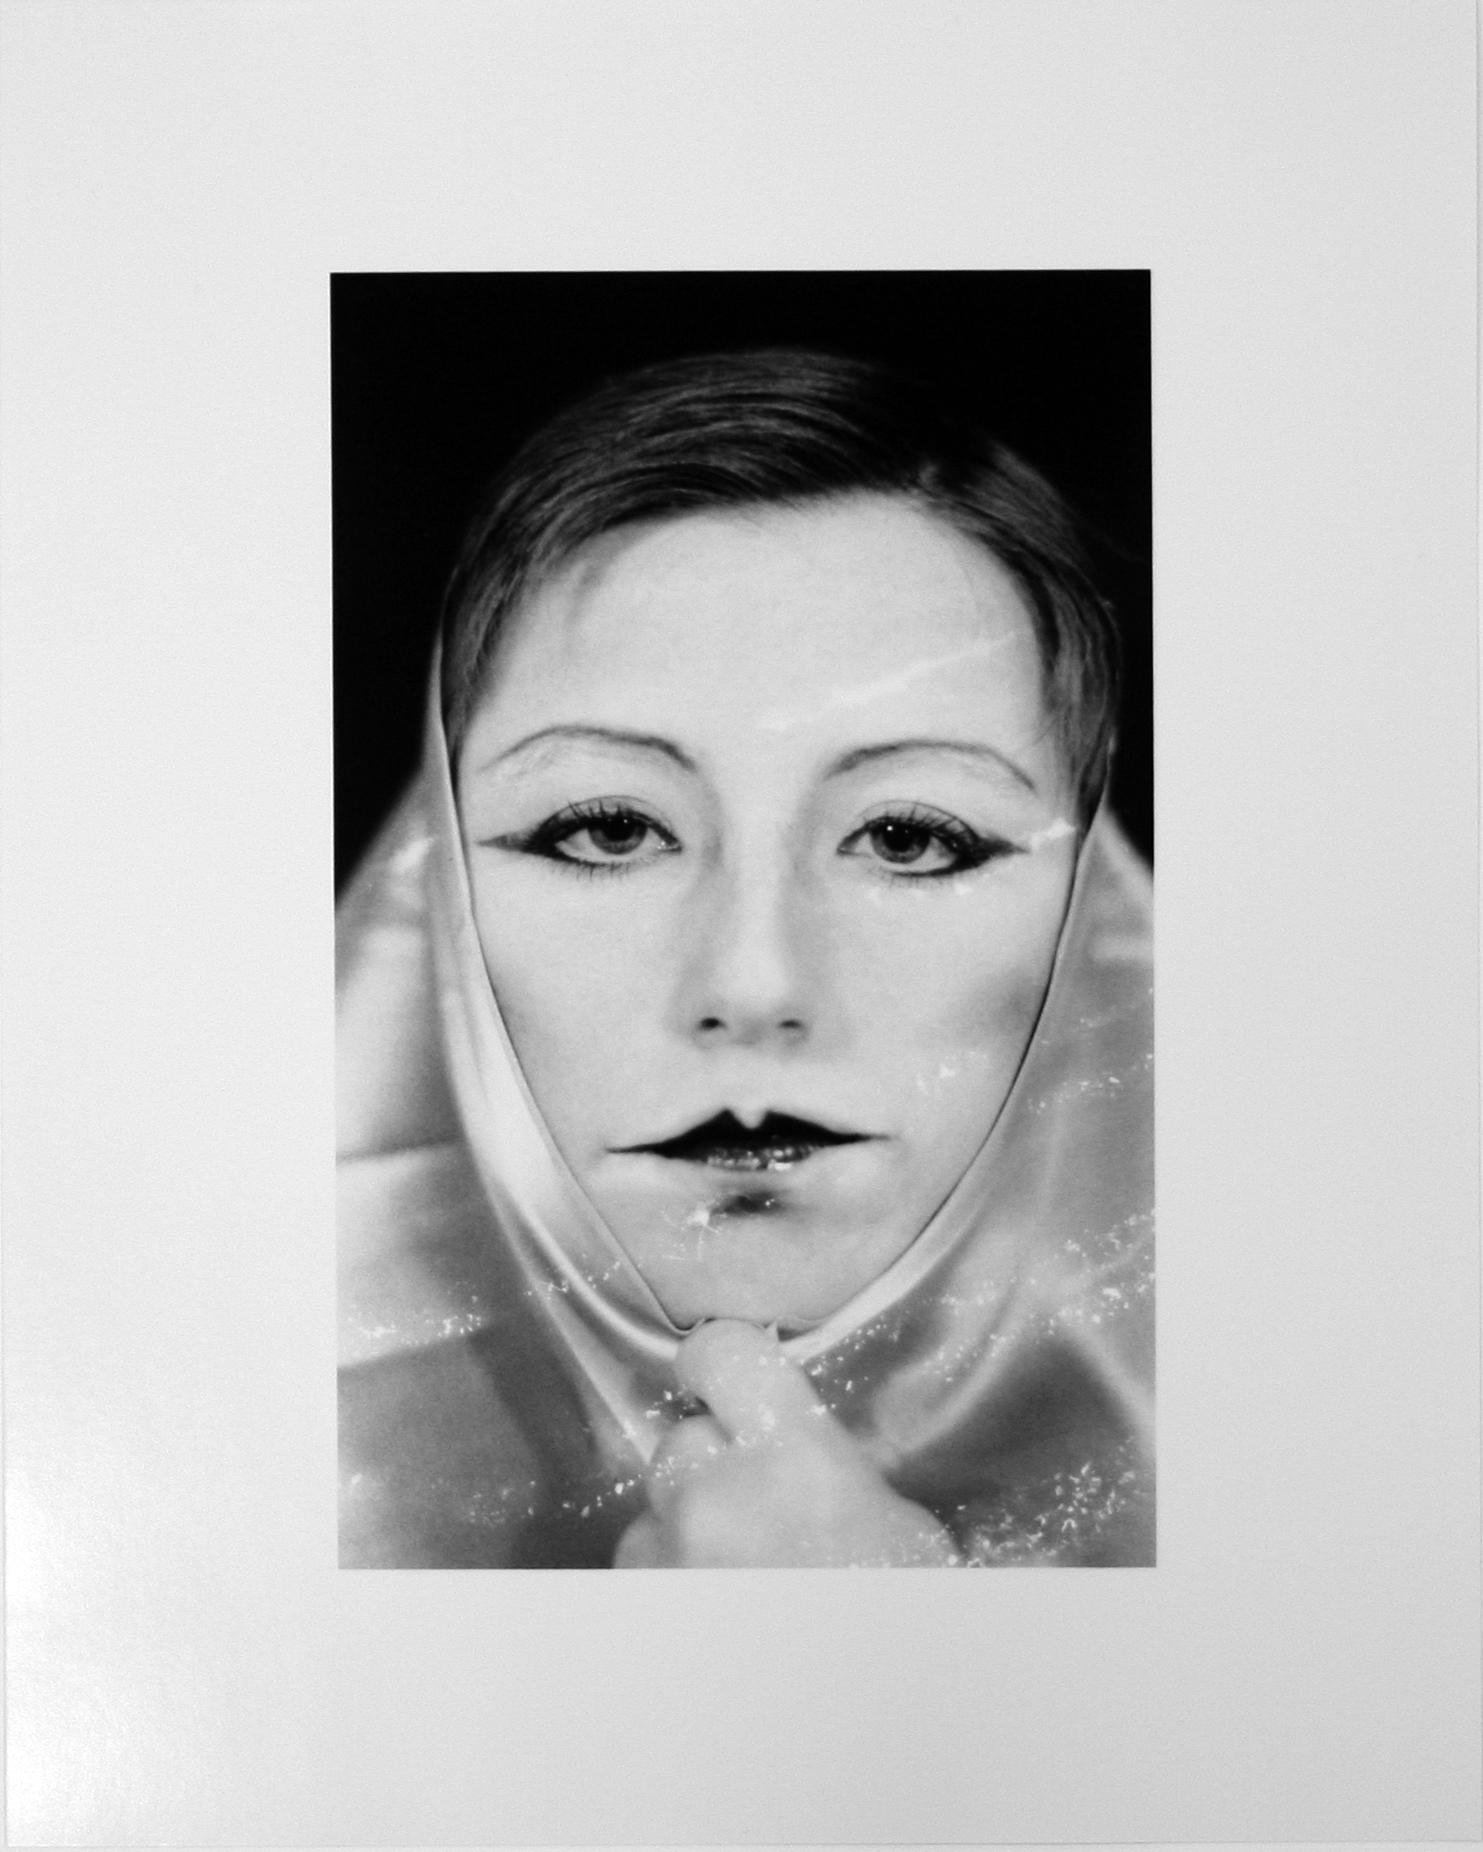 Cindy Sherman, Untitled, 1975